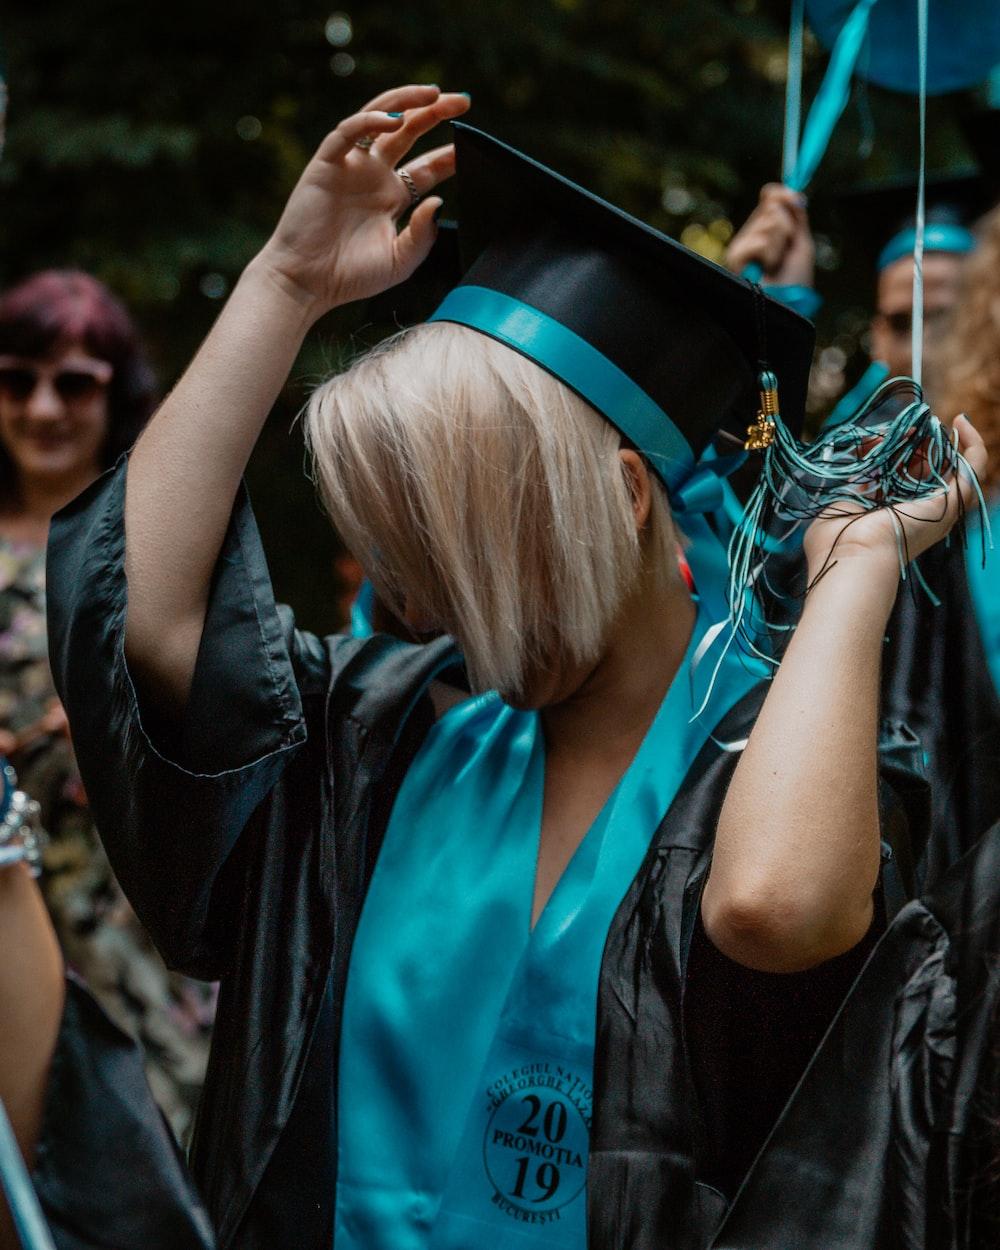 woman wearing blue and black graduation coat